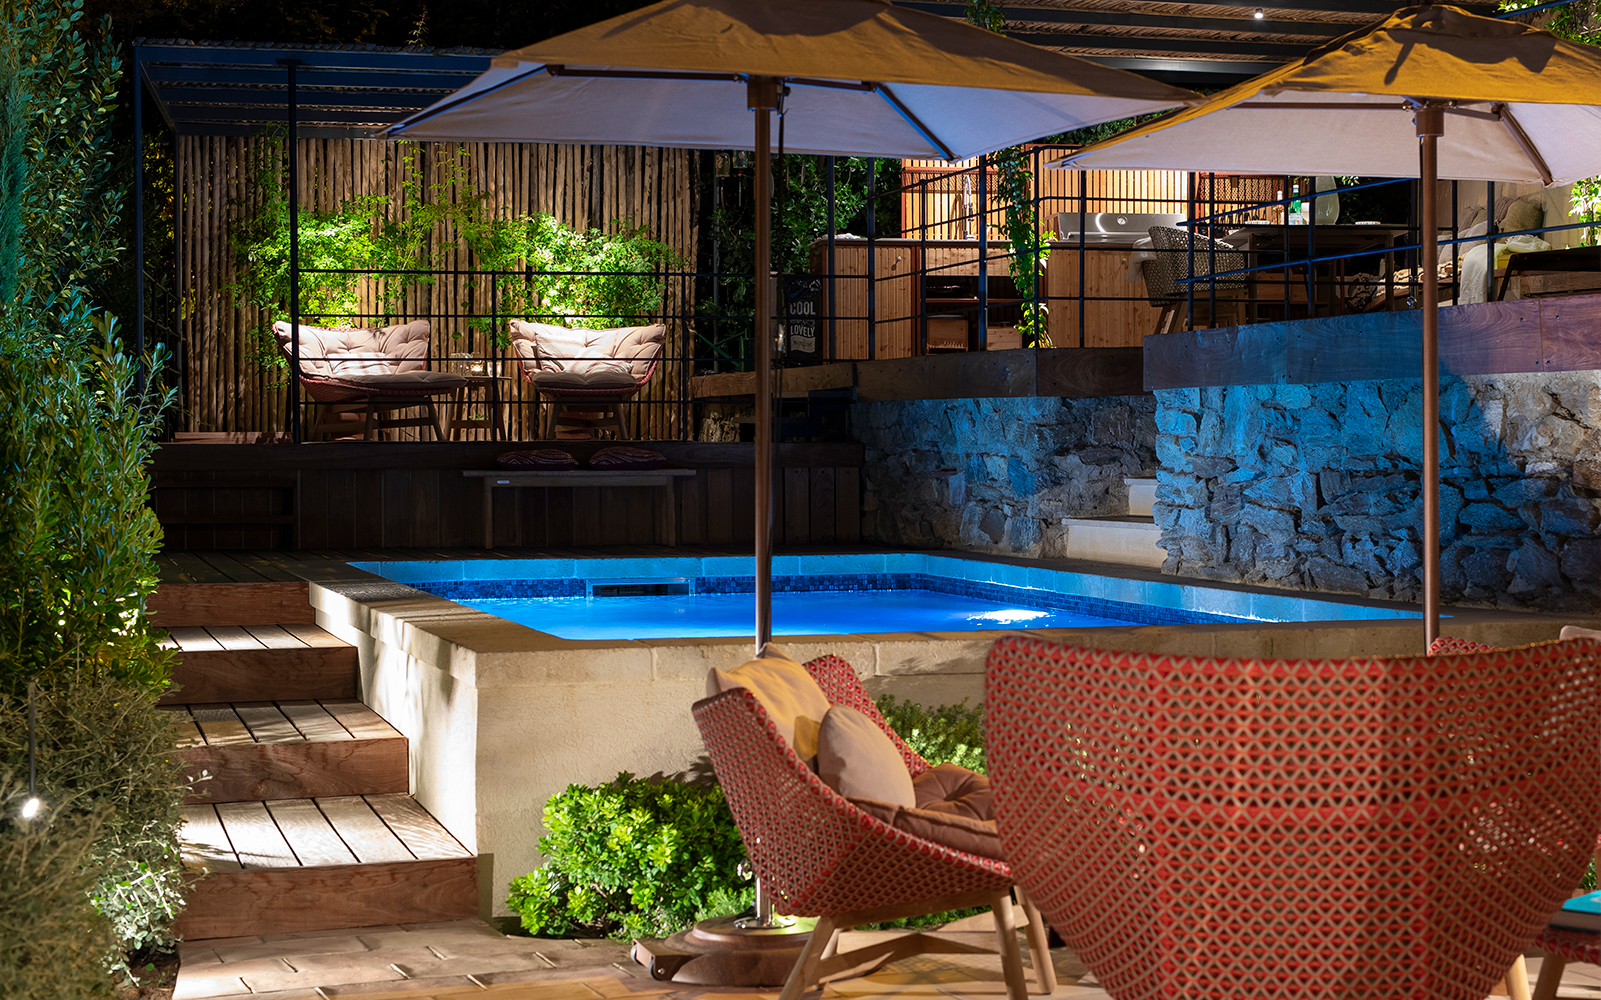 in-lite outdoor lighting, buitenverlichting, villa tuin, exlcusief lichtplan